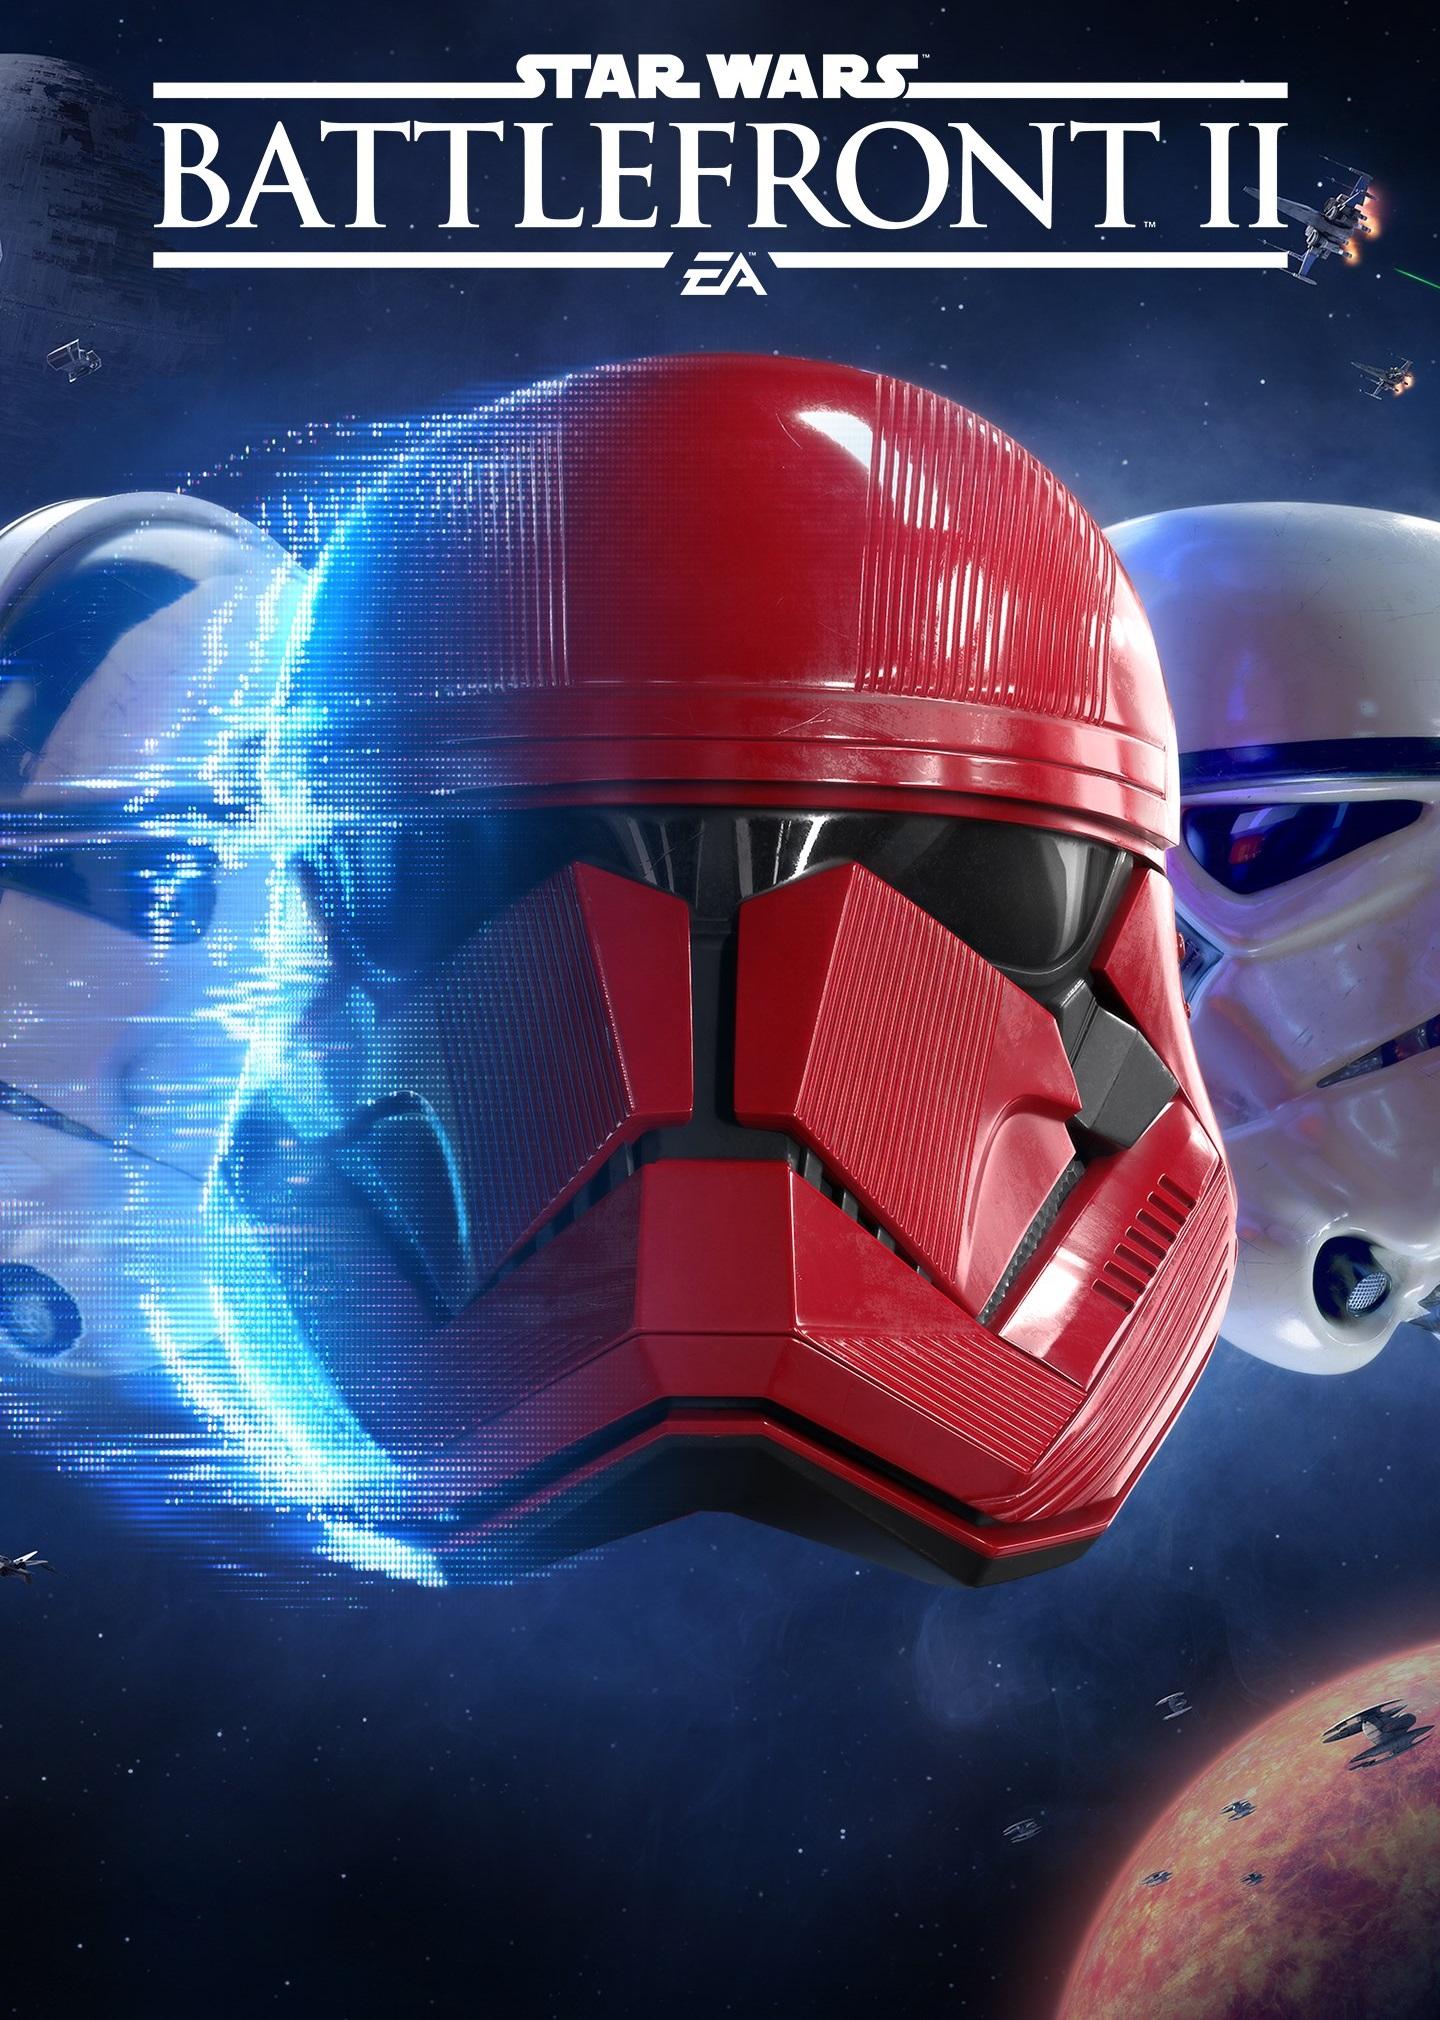 Star Wars Battlefront Ii Dice Star Wars Battlefront Wiki Fandom